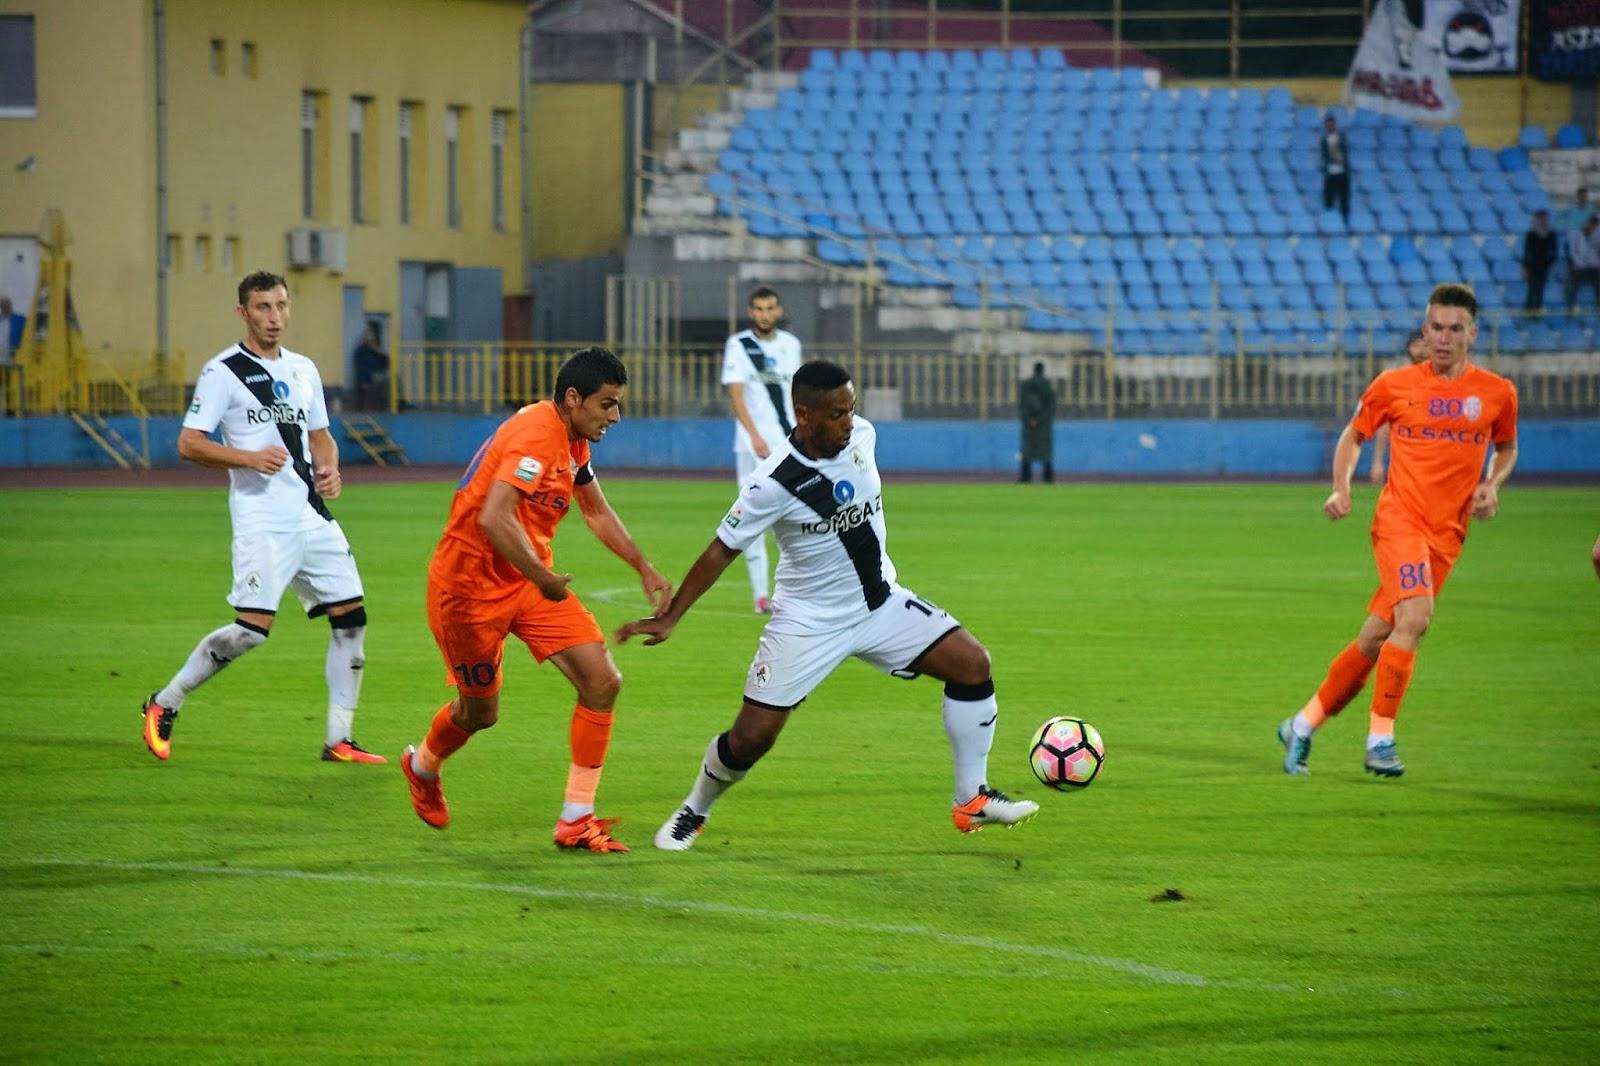 Ponturi fotbal Gaz Metan Mediaş - FC Botoşani - Liga 1 ...  |Gaz Metan-botoşani